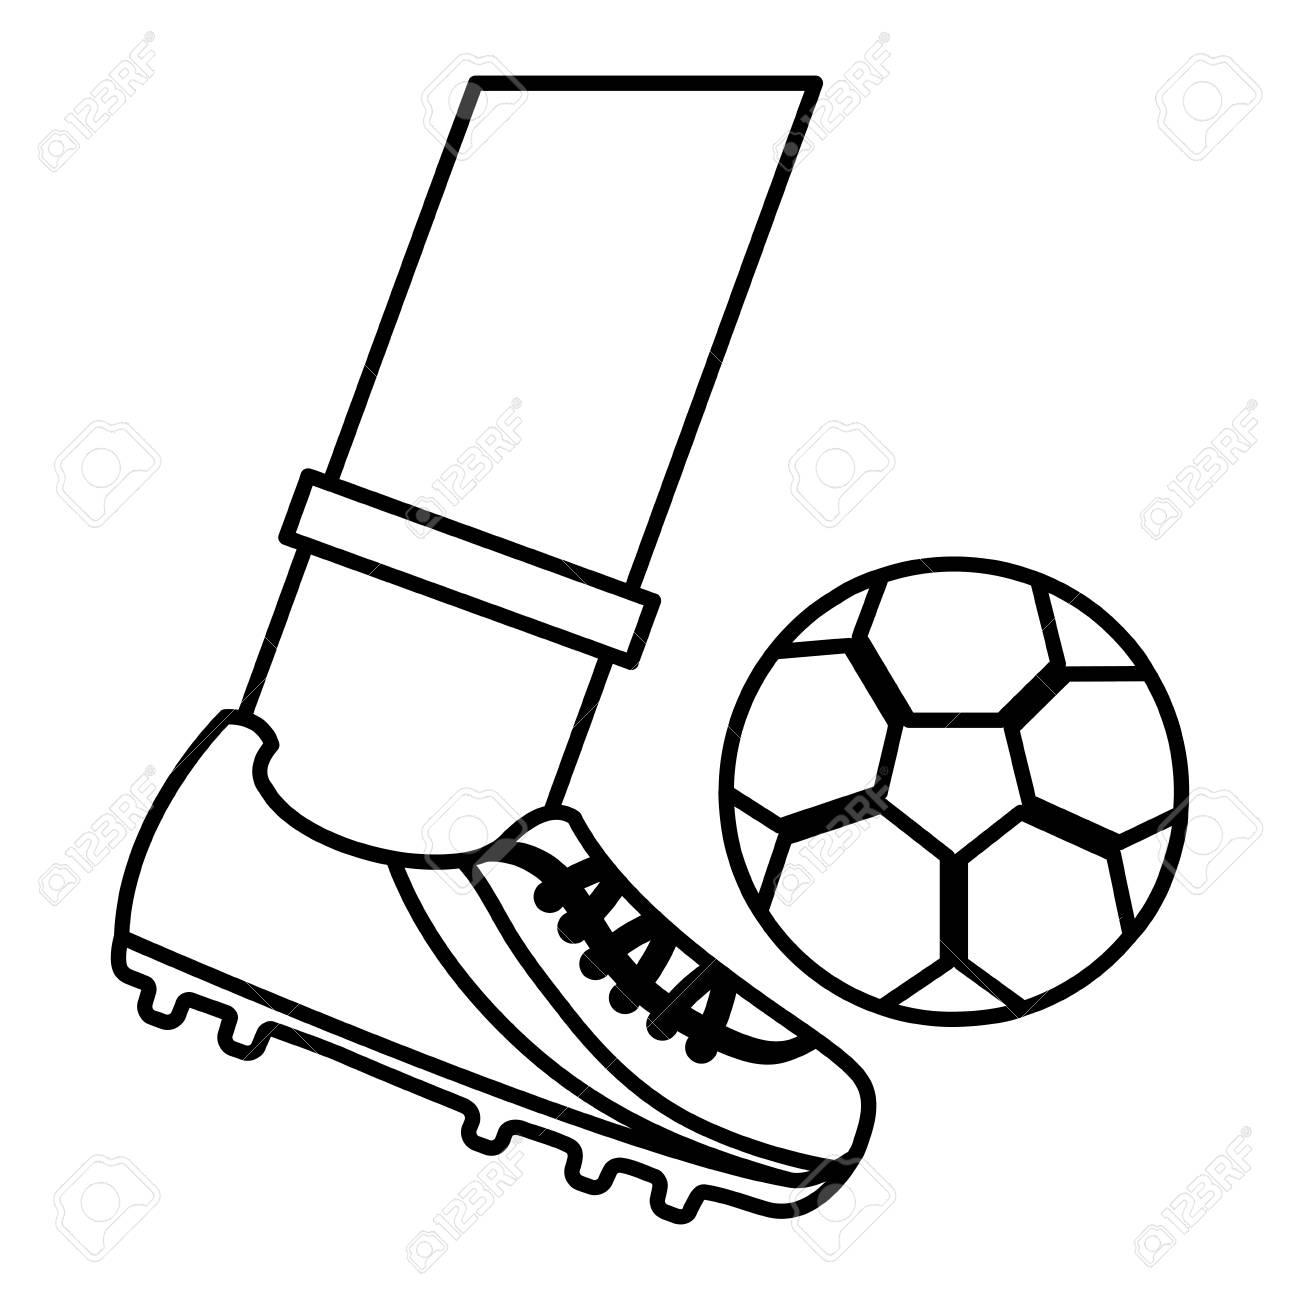 foot kicking ball football soccer icon image vector illustration...